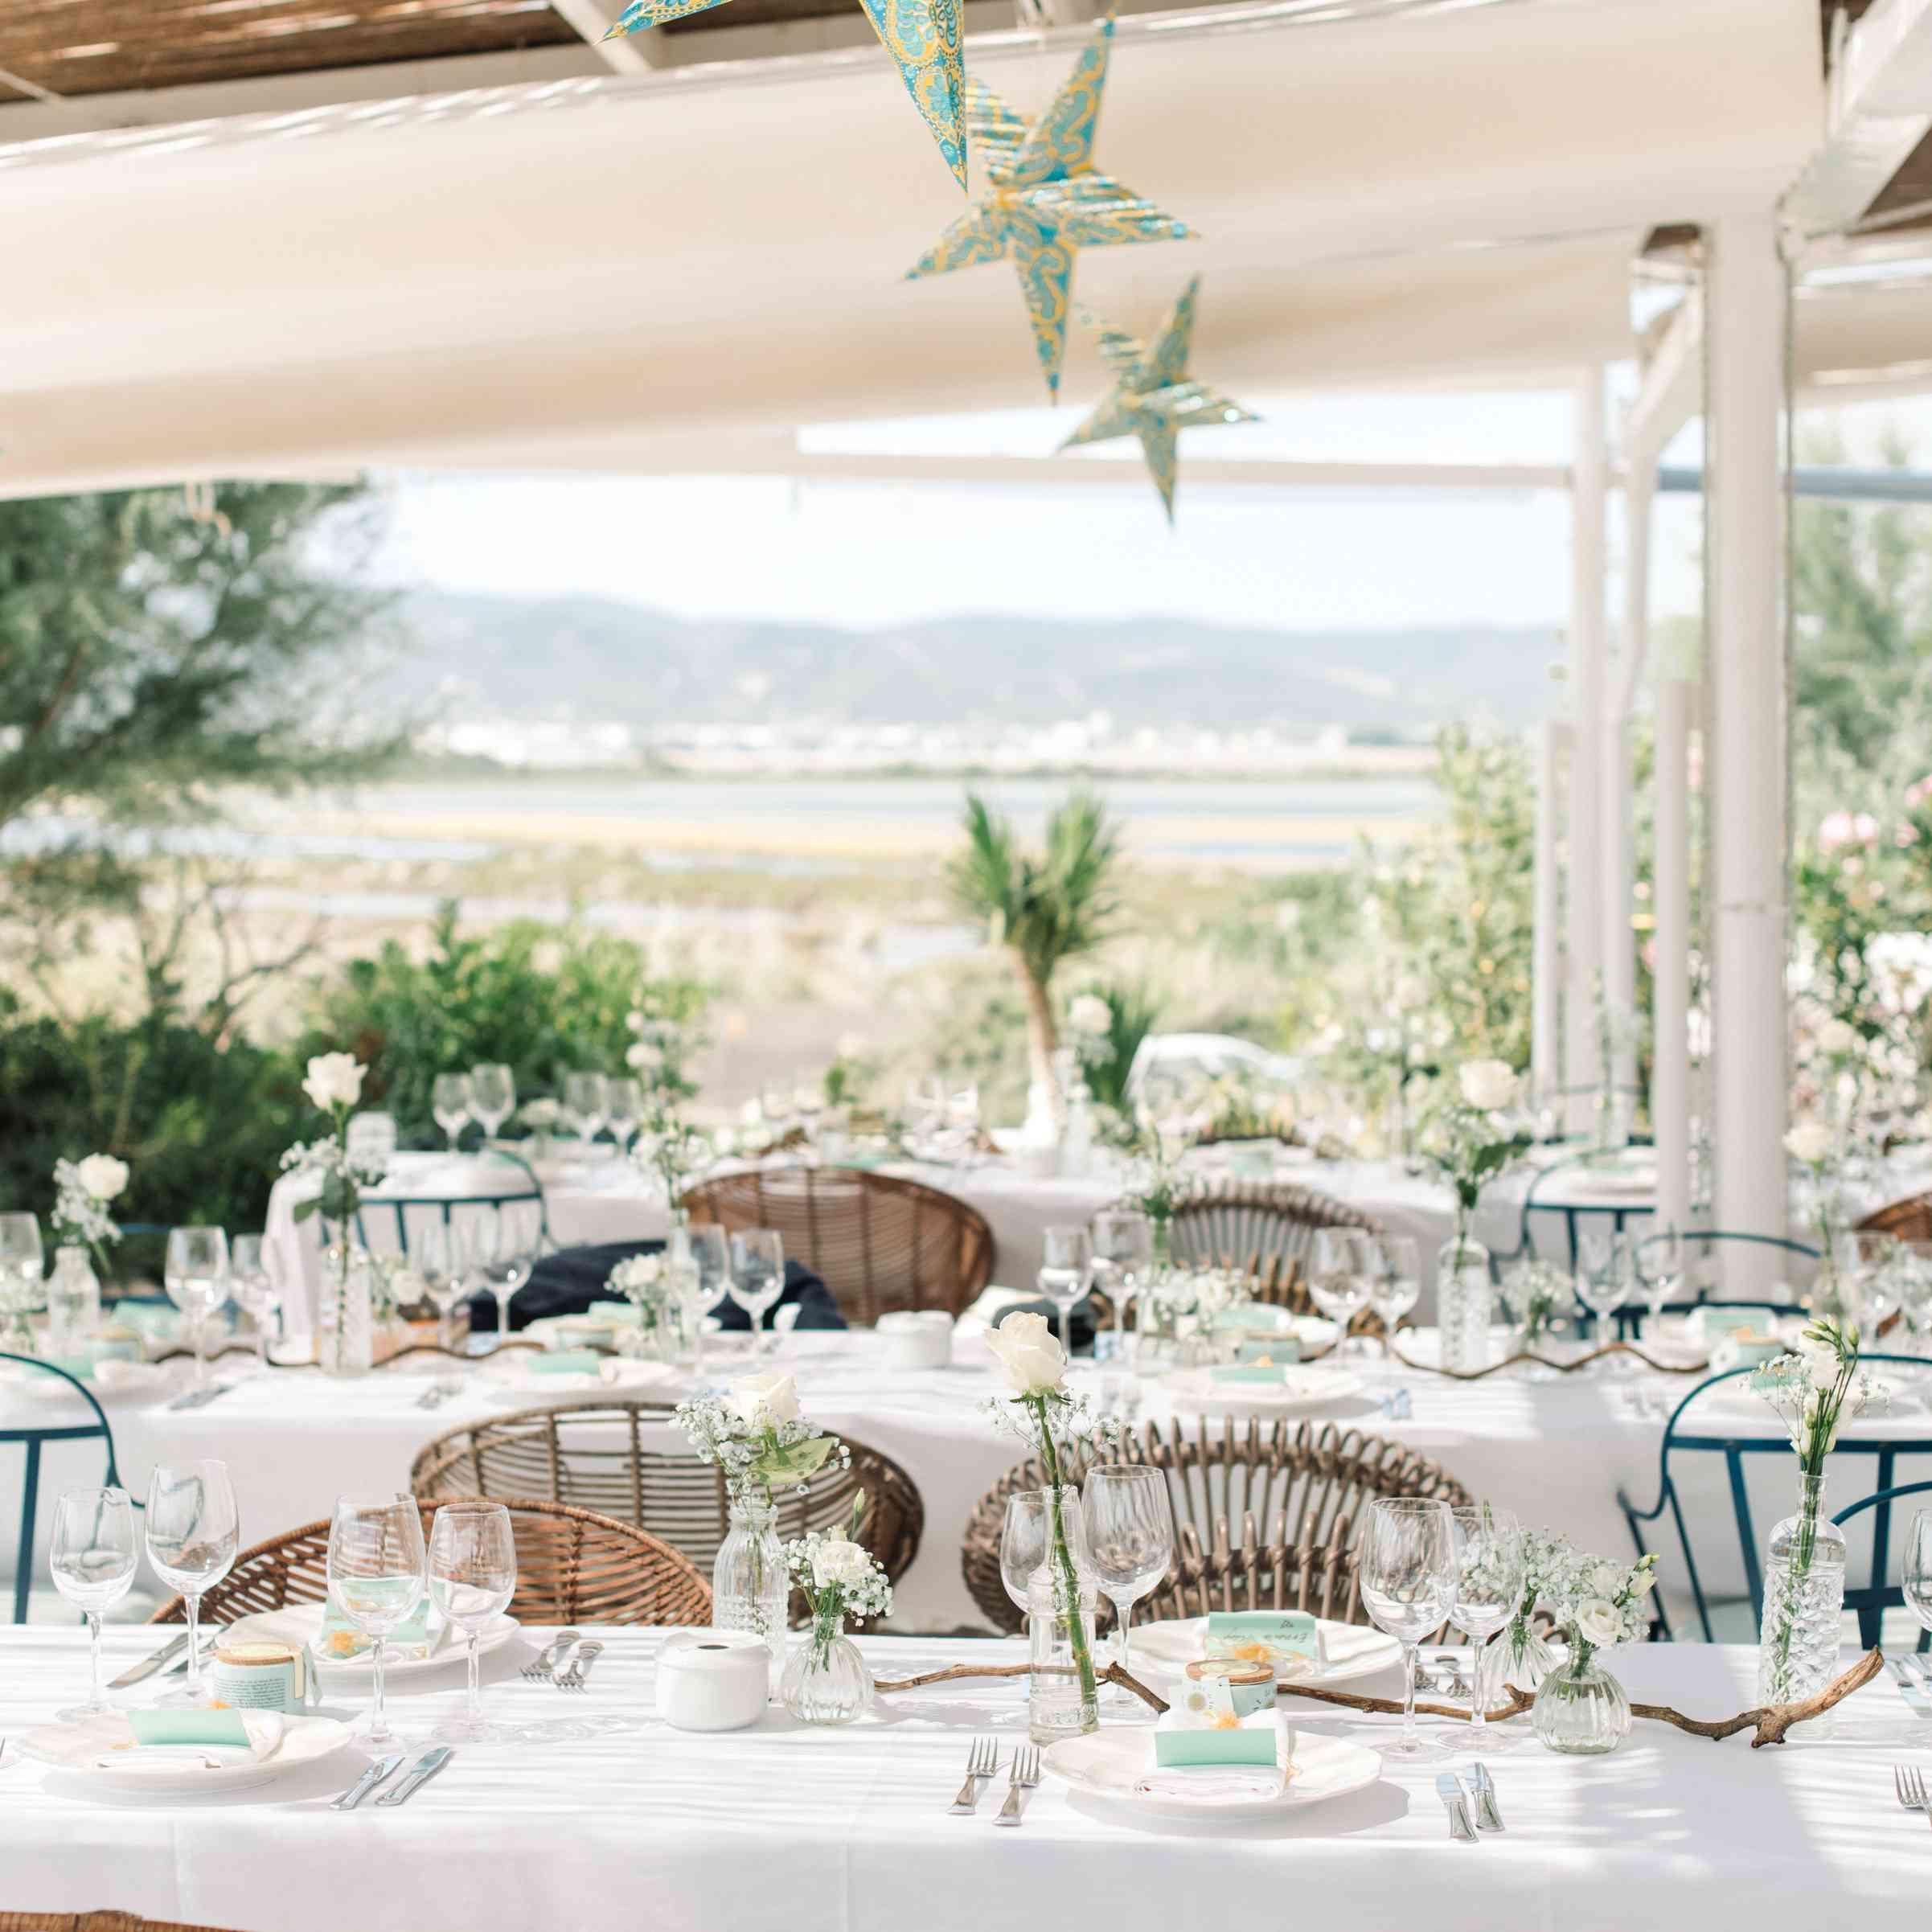 Reception dinner table arrangement